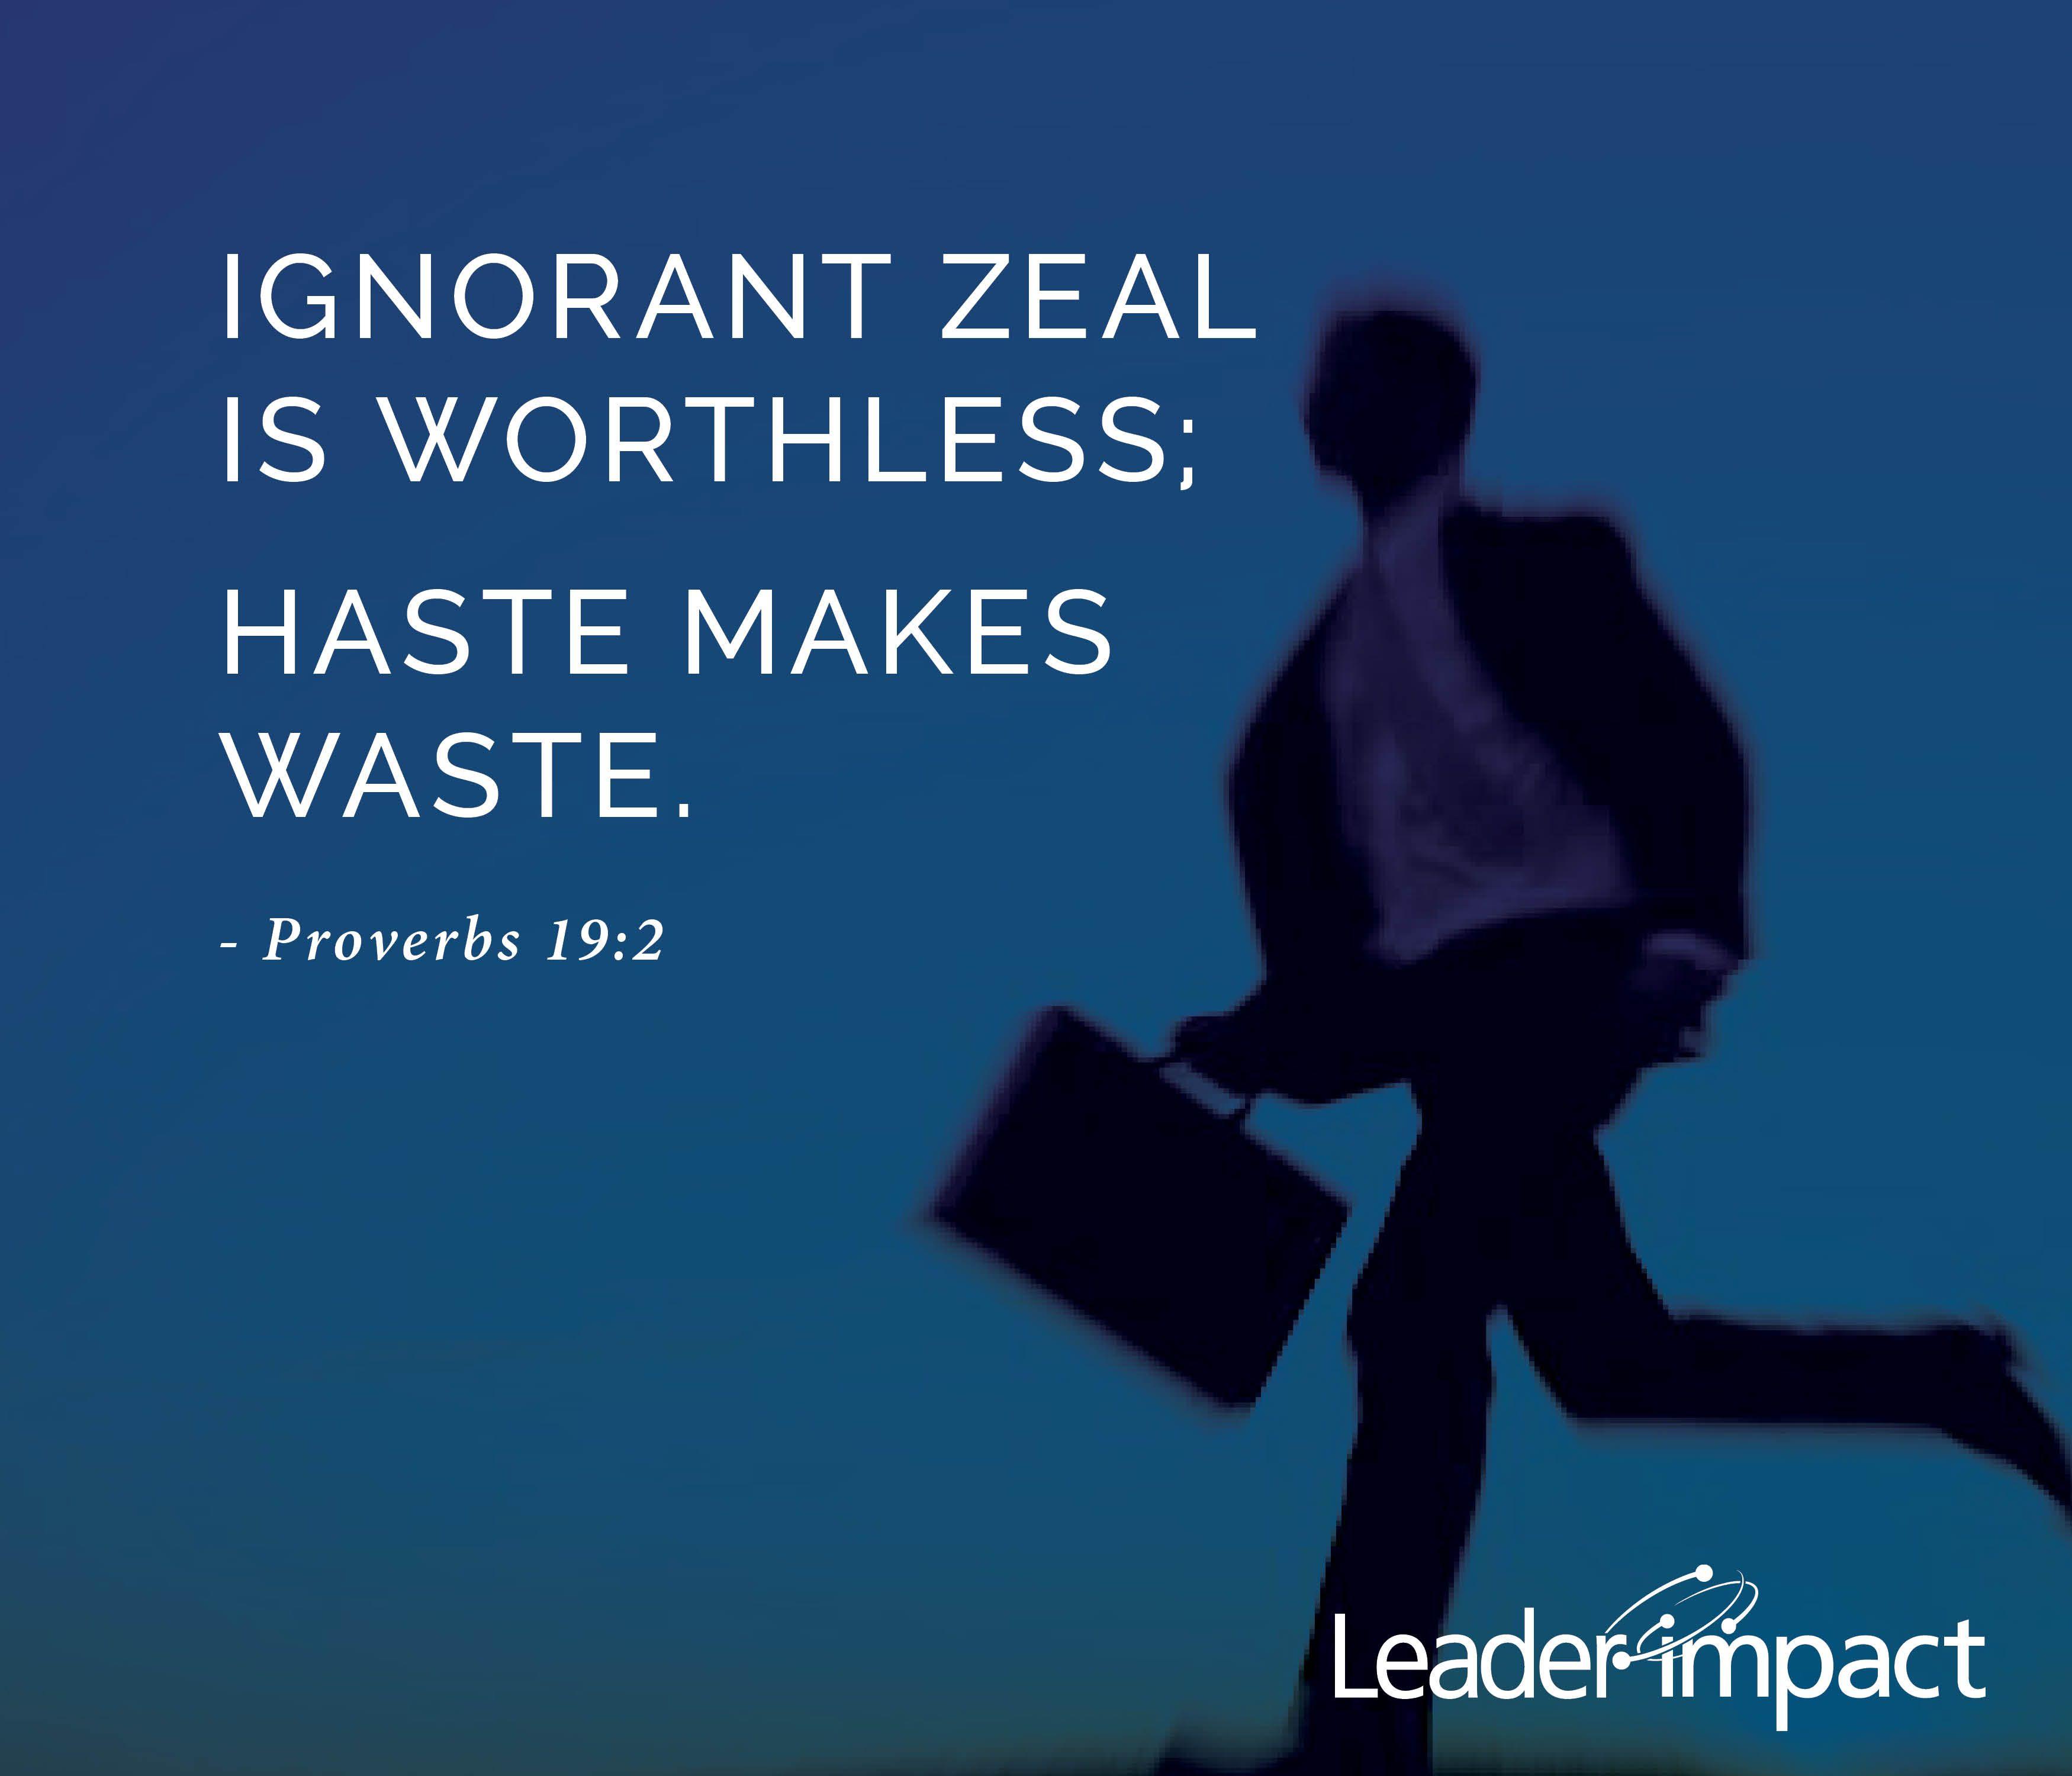 haste makes waste proverb